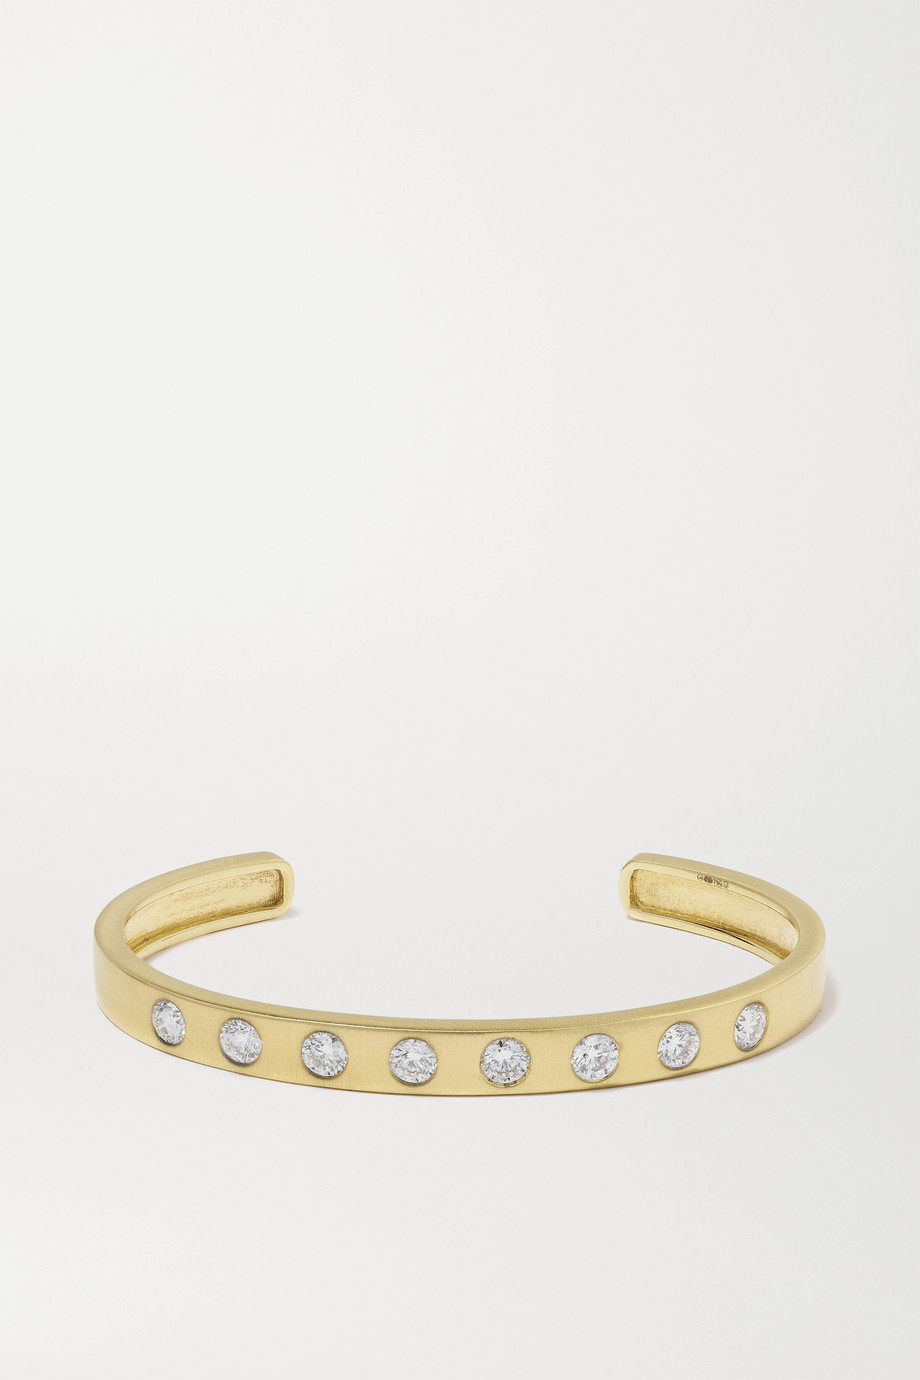 Octavia Elizabeth + NET SUSTAIN Sanded 18-karat recycled gold diamond cuff